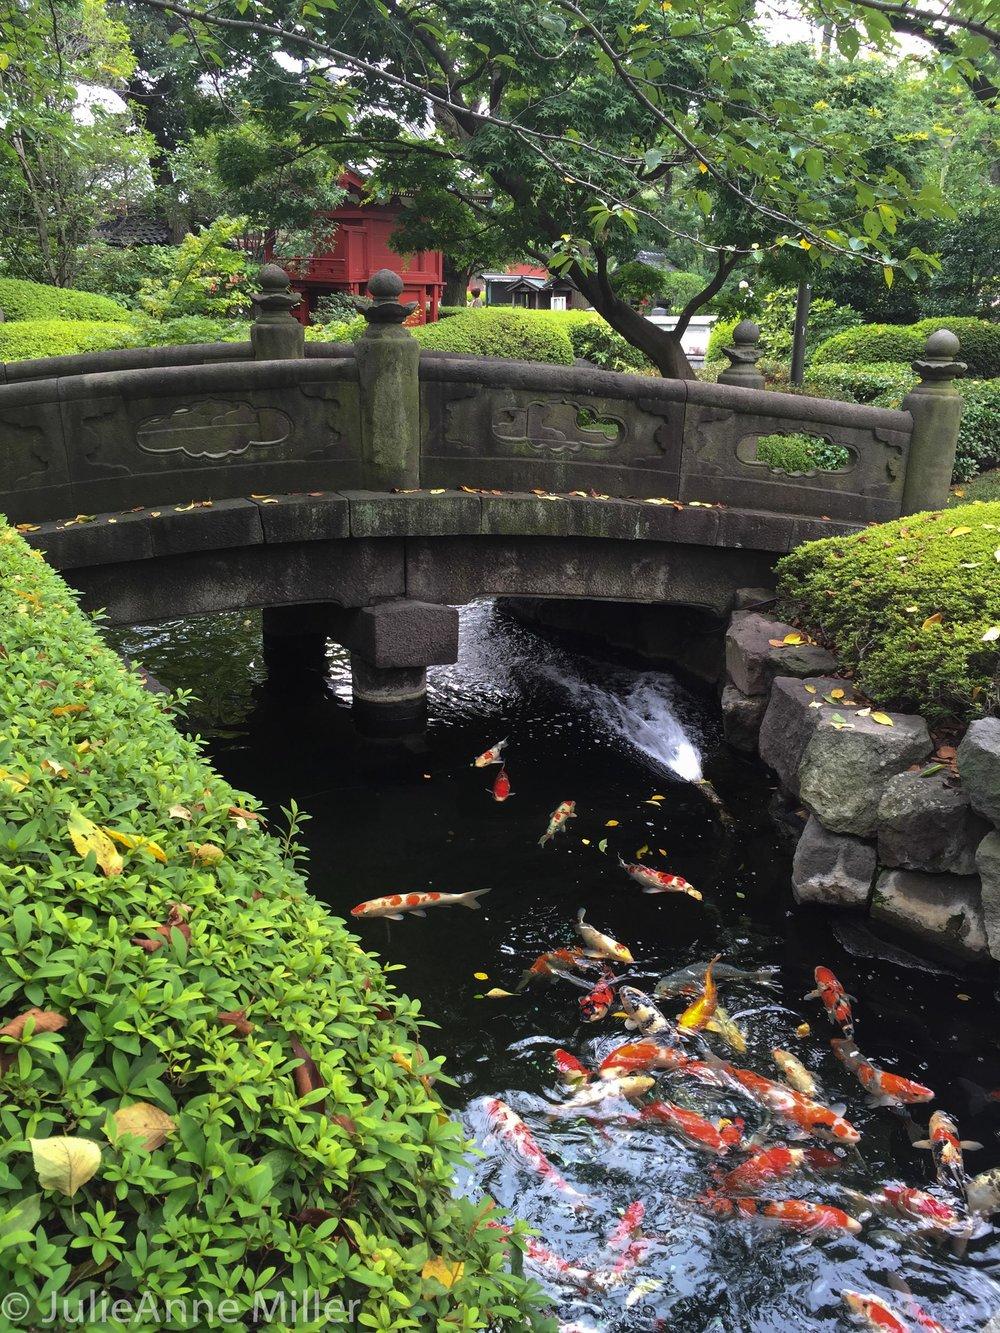 tokyo's oldest stone bridge at Asakusa temple garden